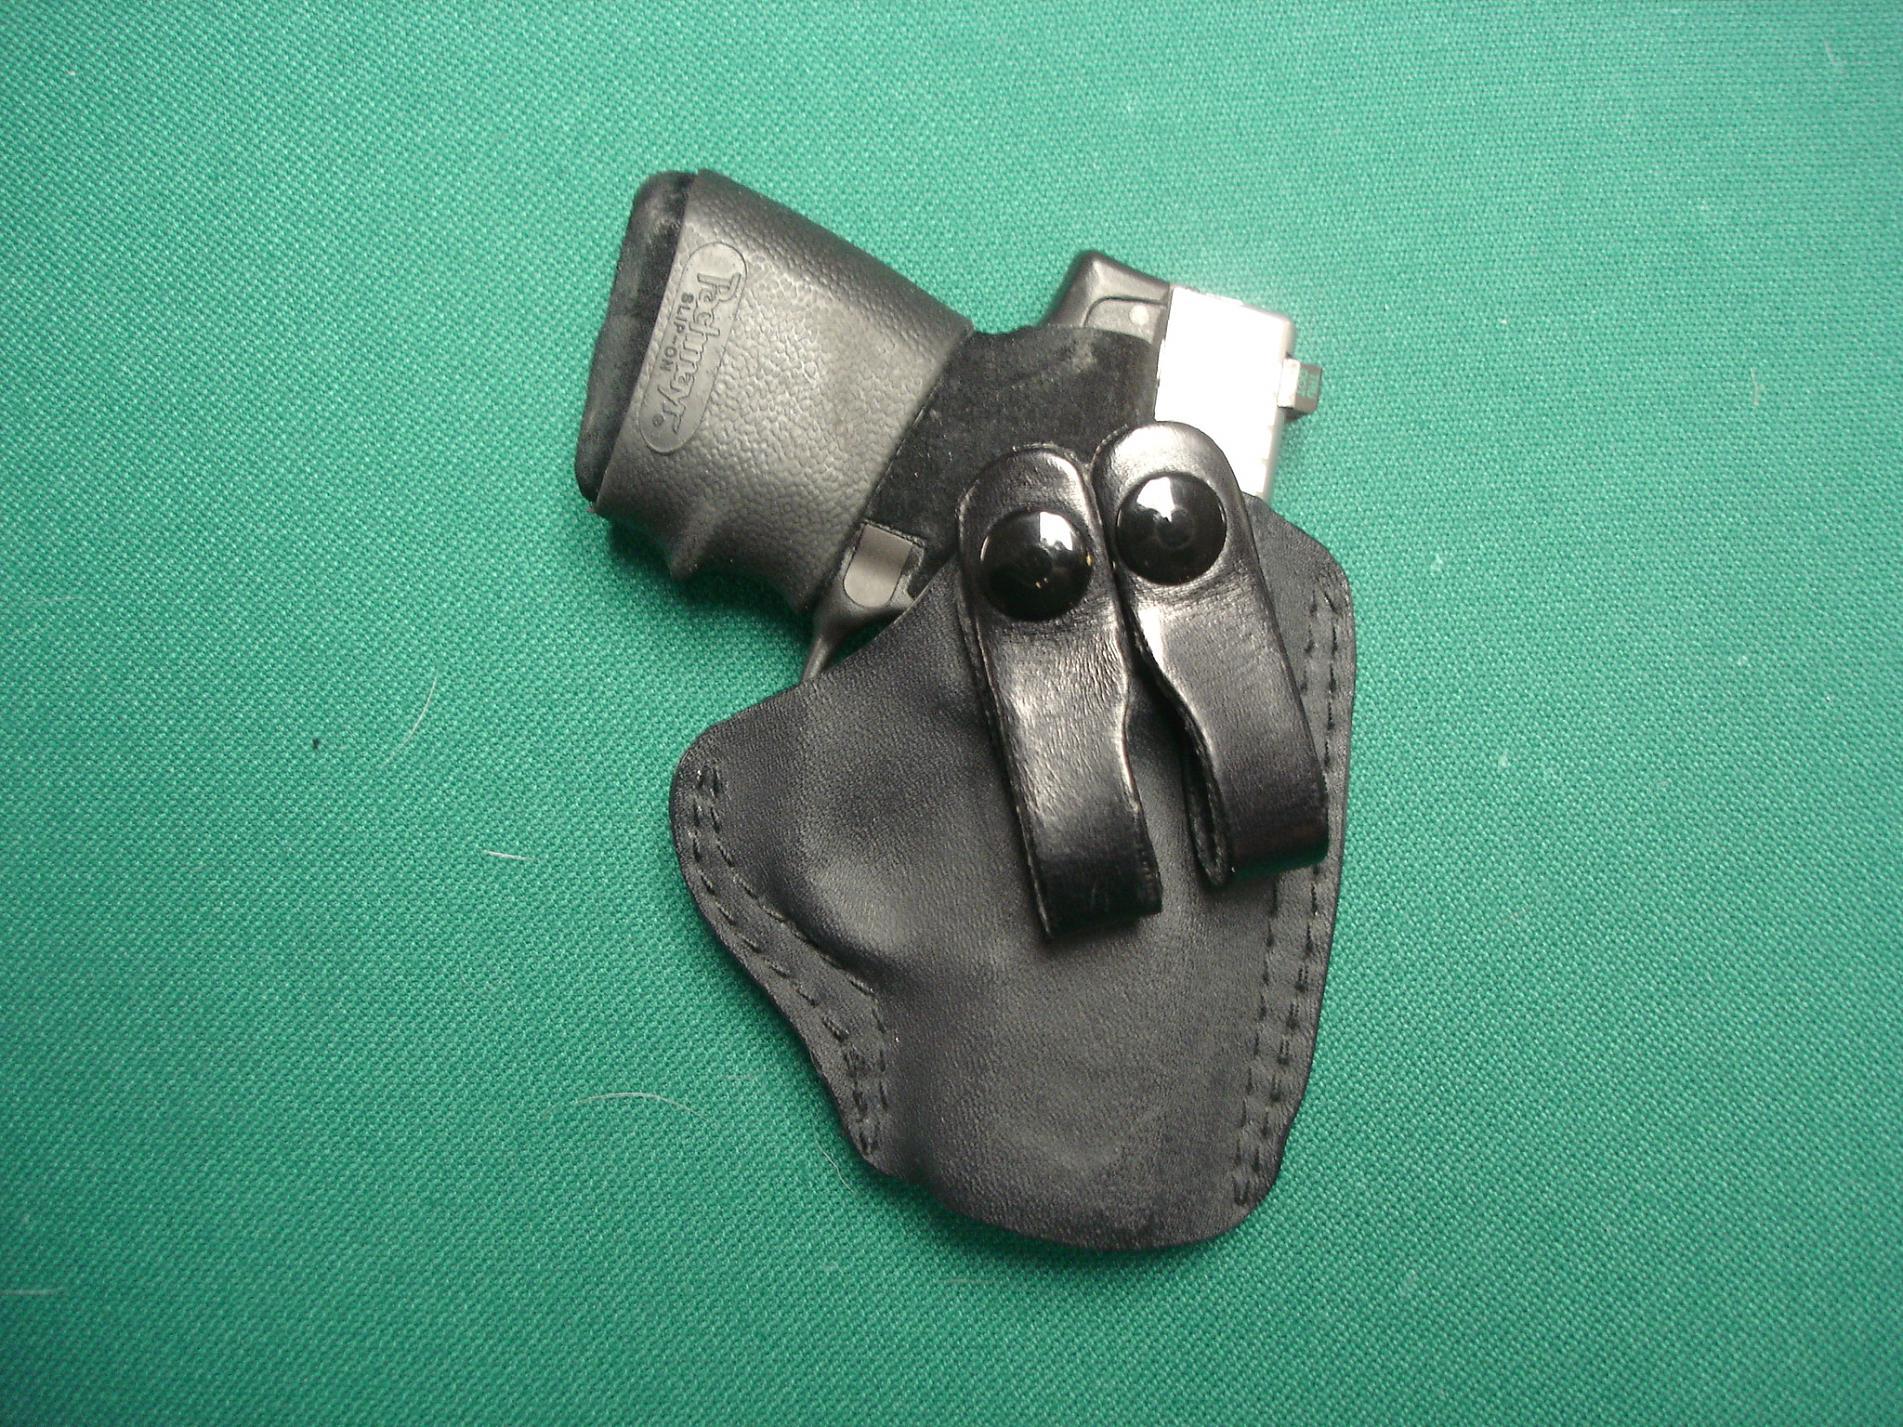 FIST kydex pocket holsters.-dsc00104.jpg